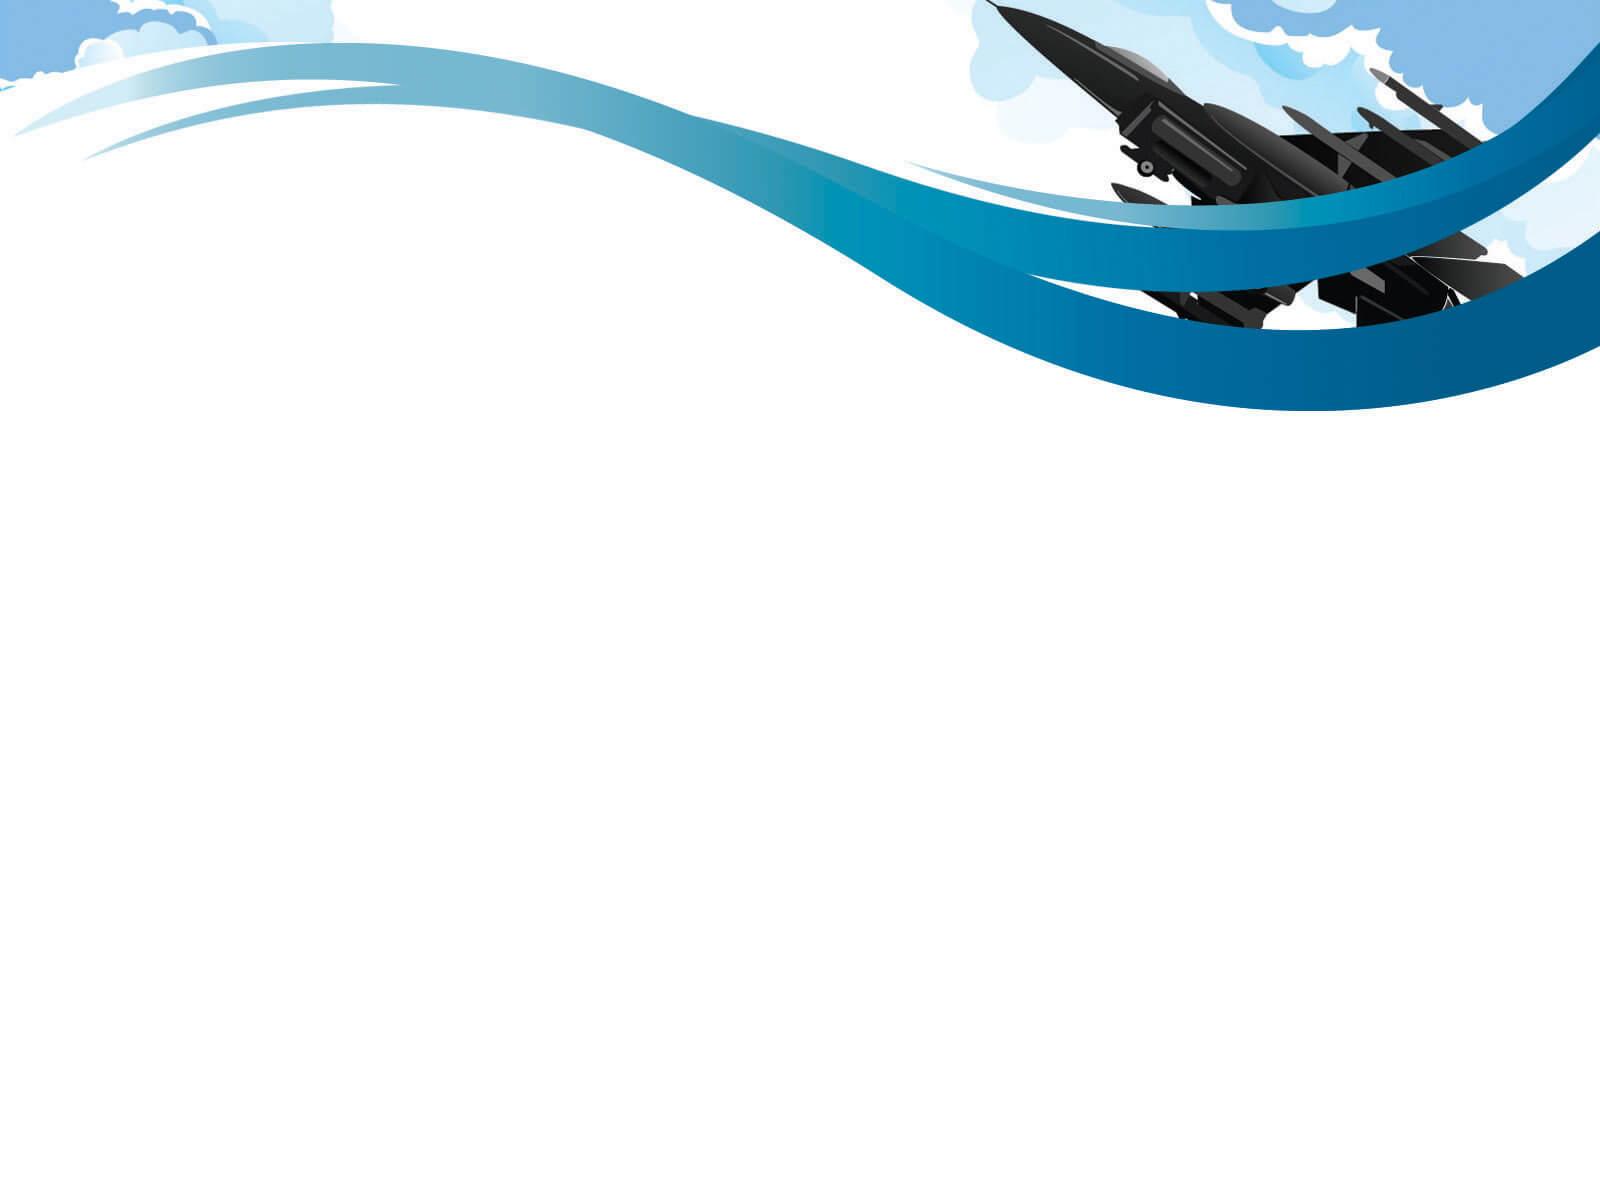 Air Force Powerpoint Templates - Black, Blue, Car With Air Force Powerpoint Template